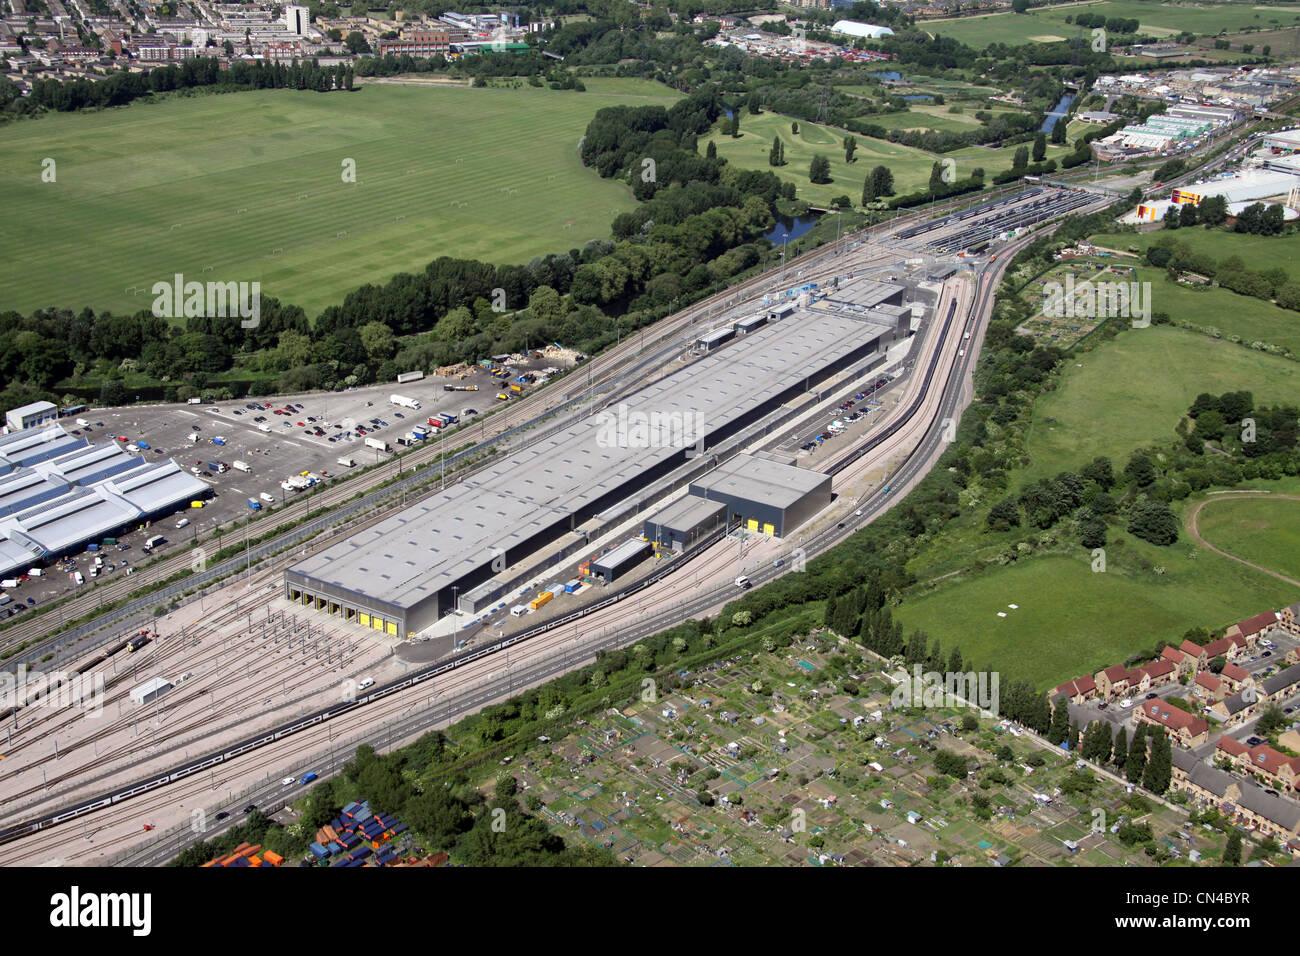 Vista aerea dell'Eurostar Engineering Center Temple Mills, Leyton, Londra E10 Immagini Stock